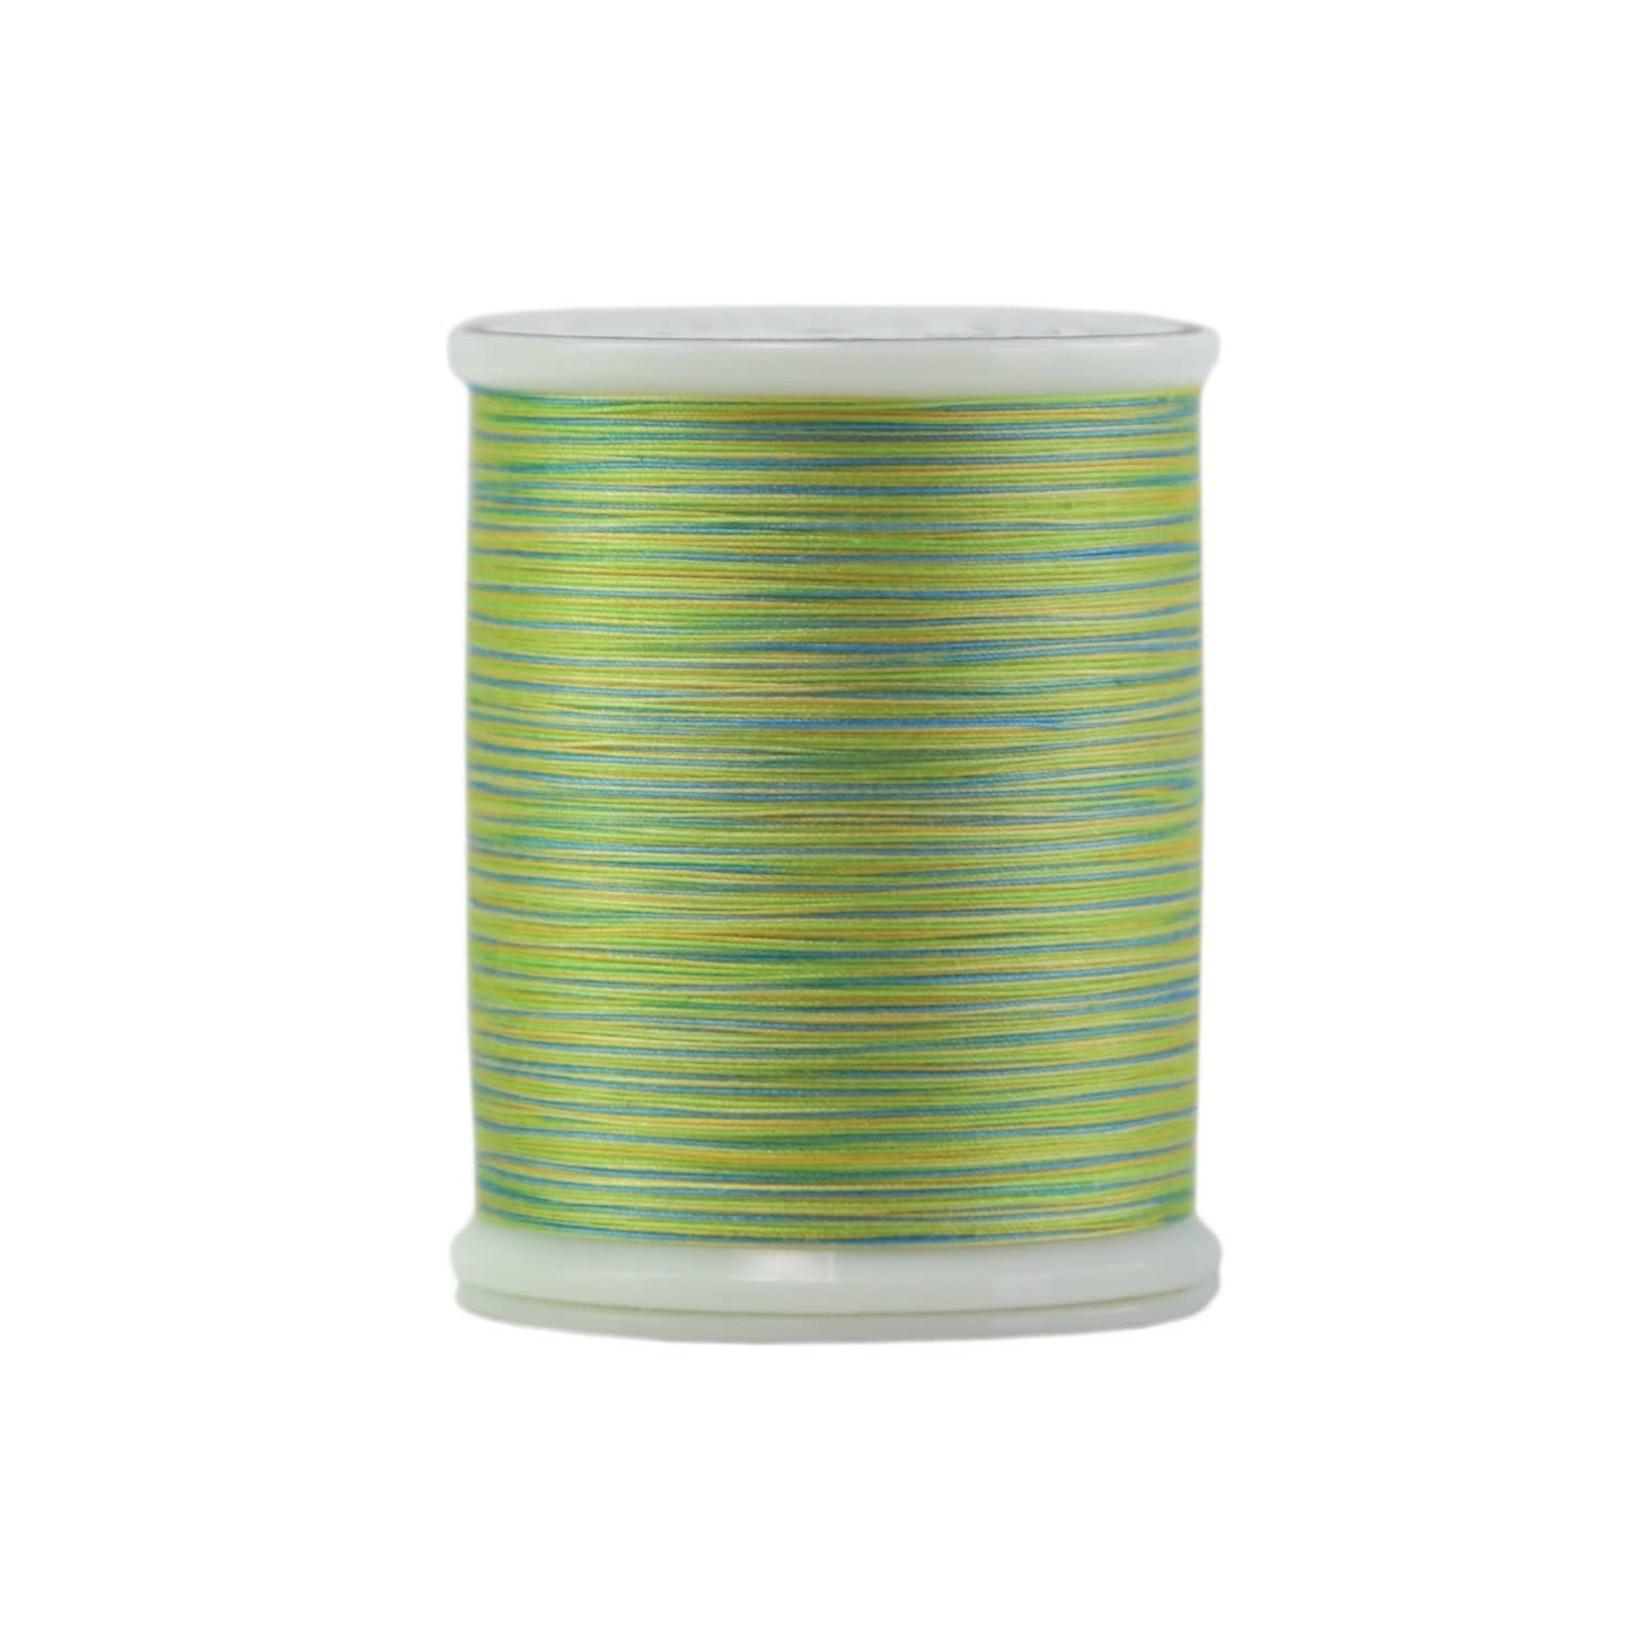 Superior Threads King Tut - #40 - 457 m - 1038 Cerefree